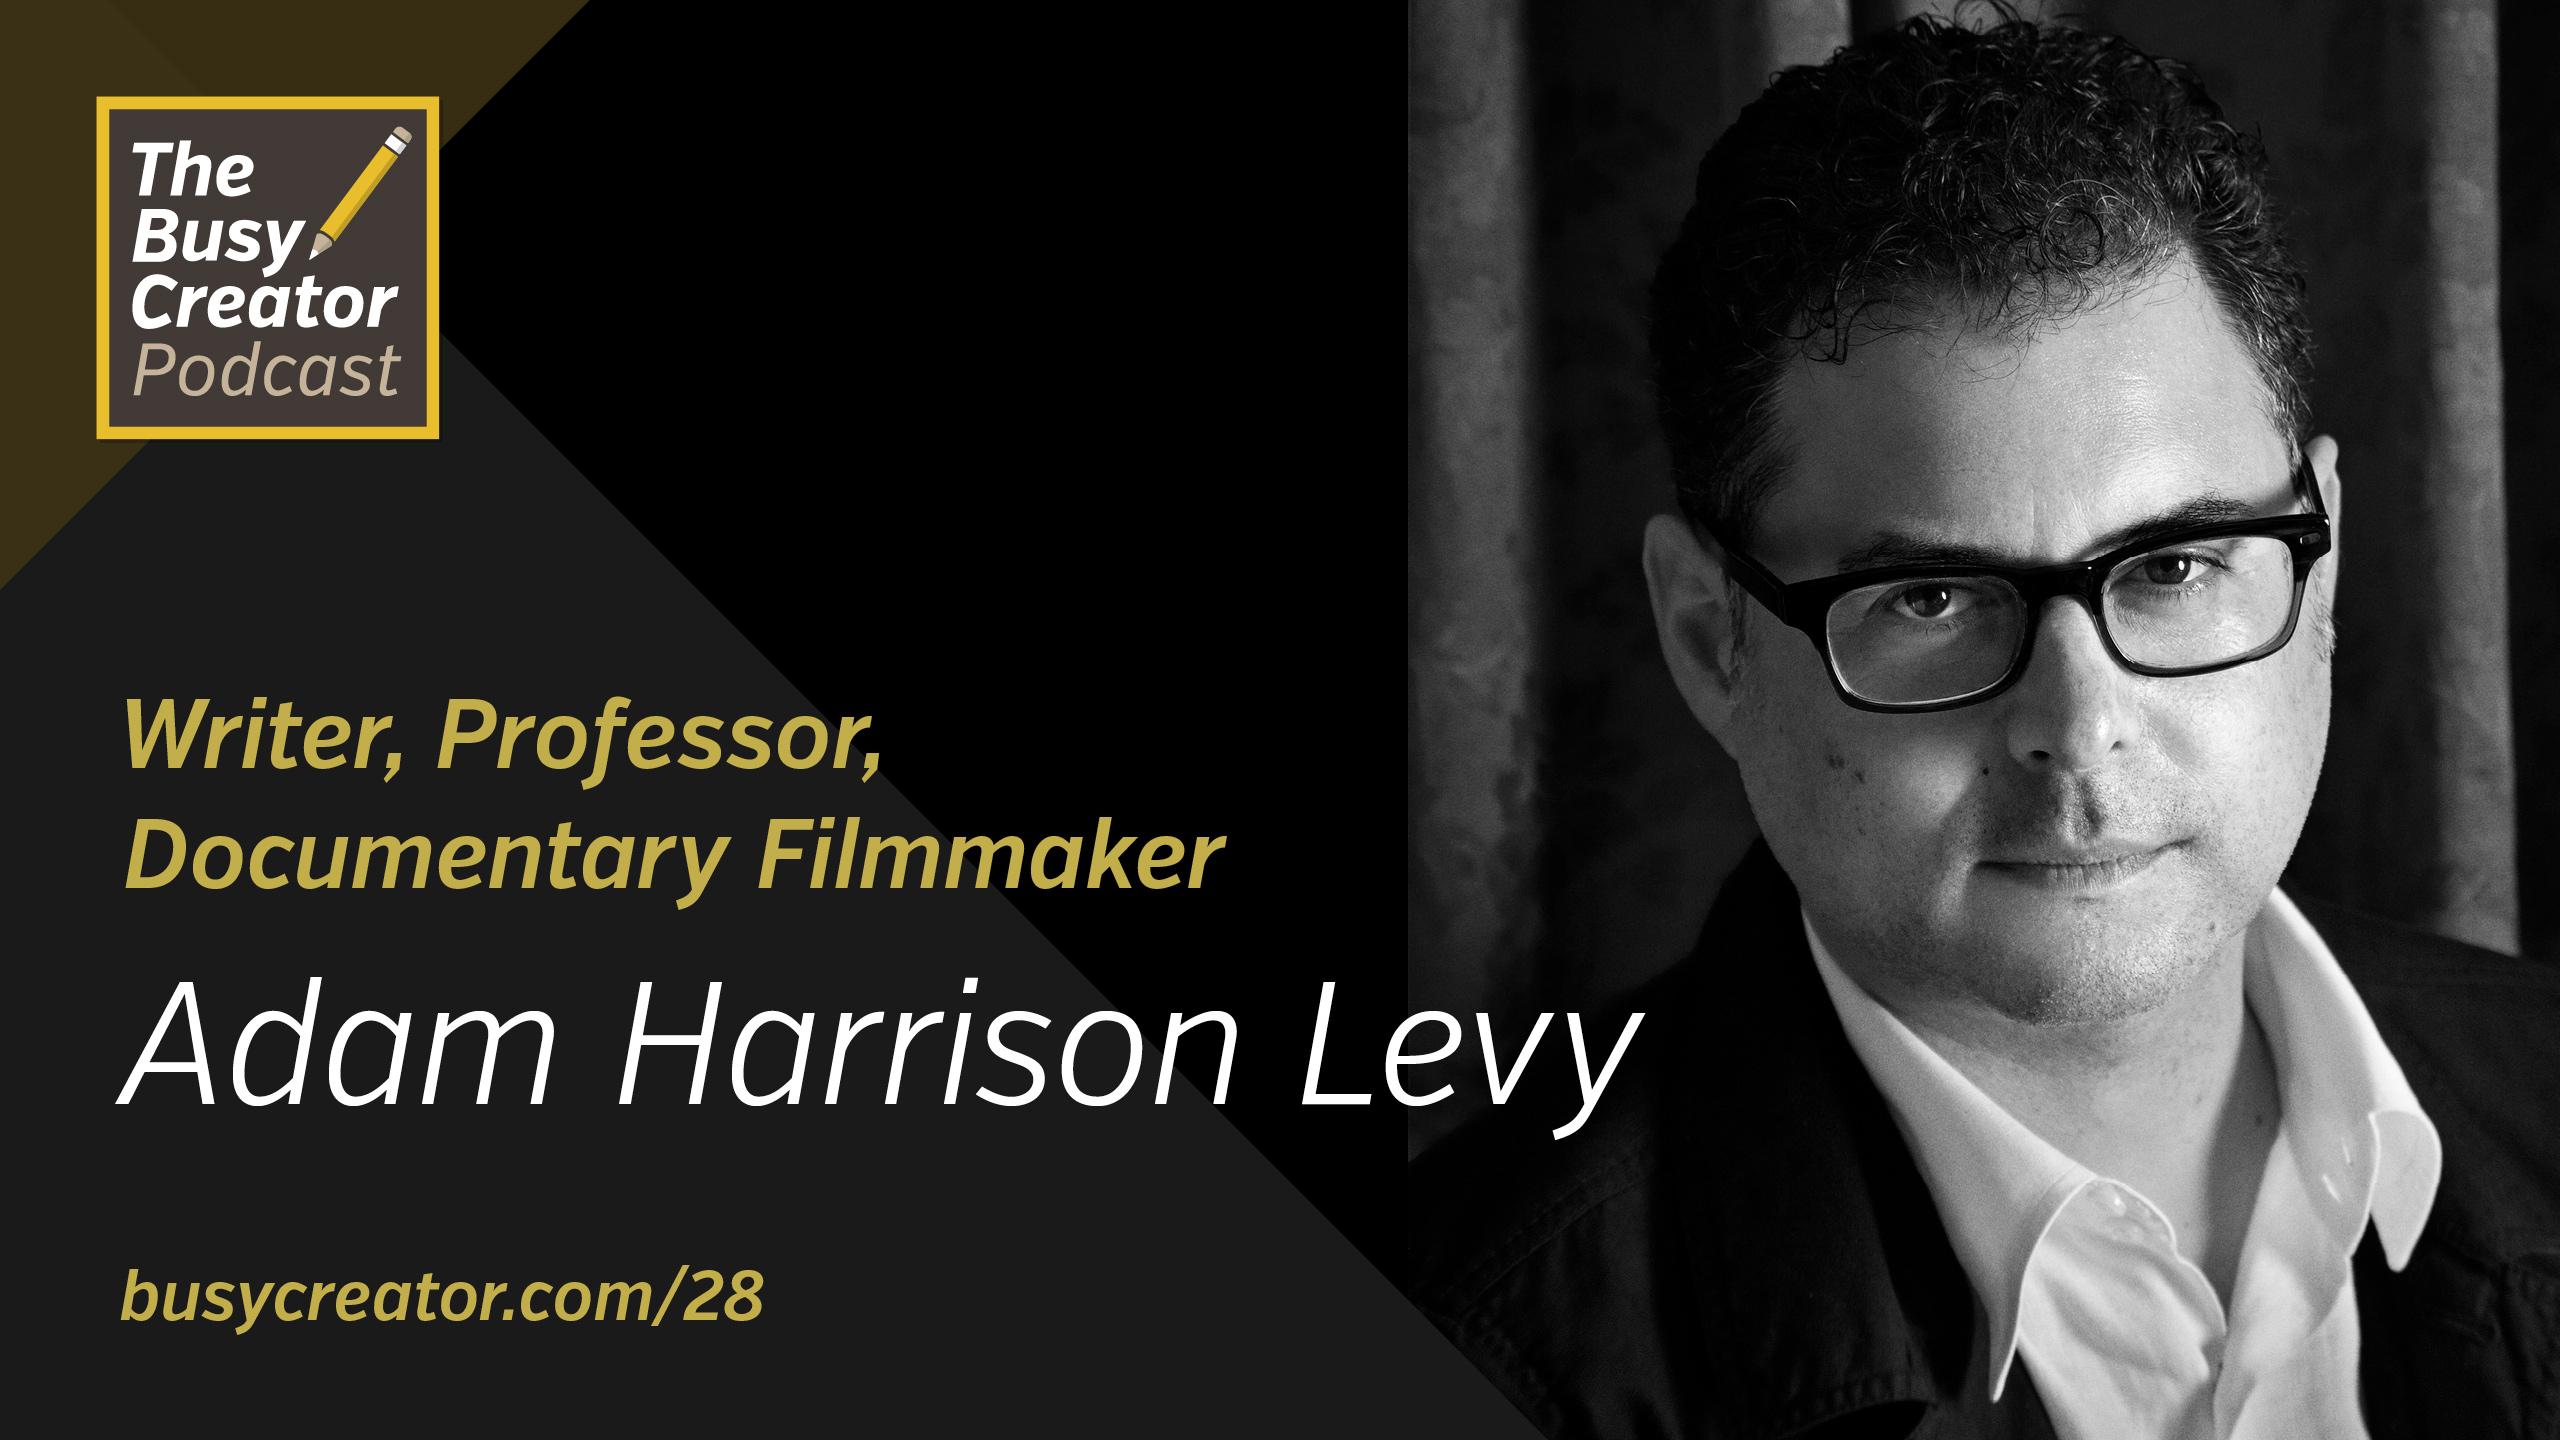 Curiosity Across Cultures with Writer, Filmmaker, and Teacher Adam Harrison Levy